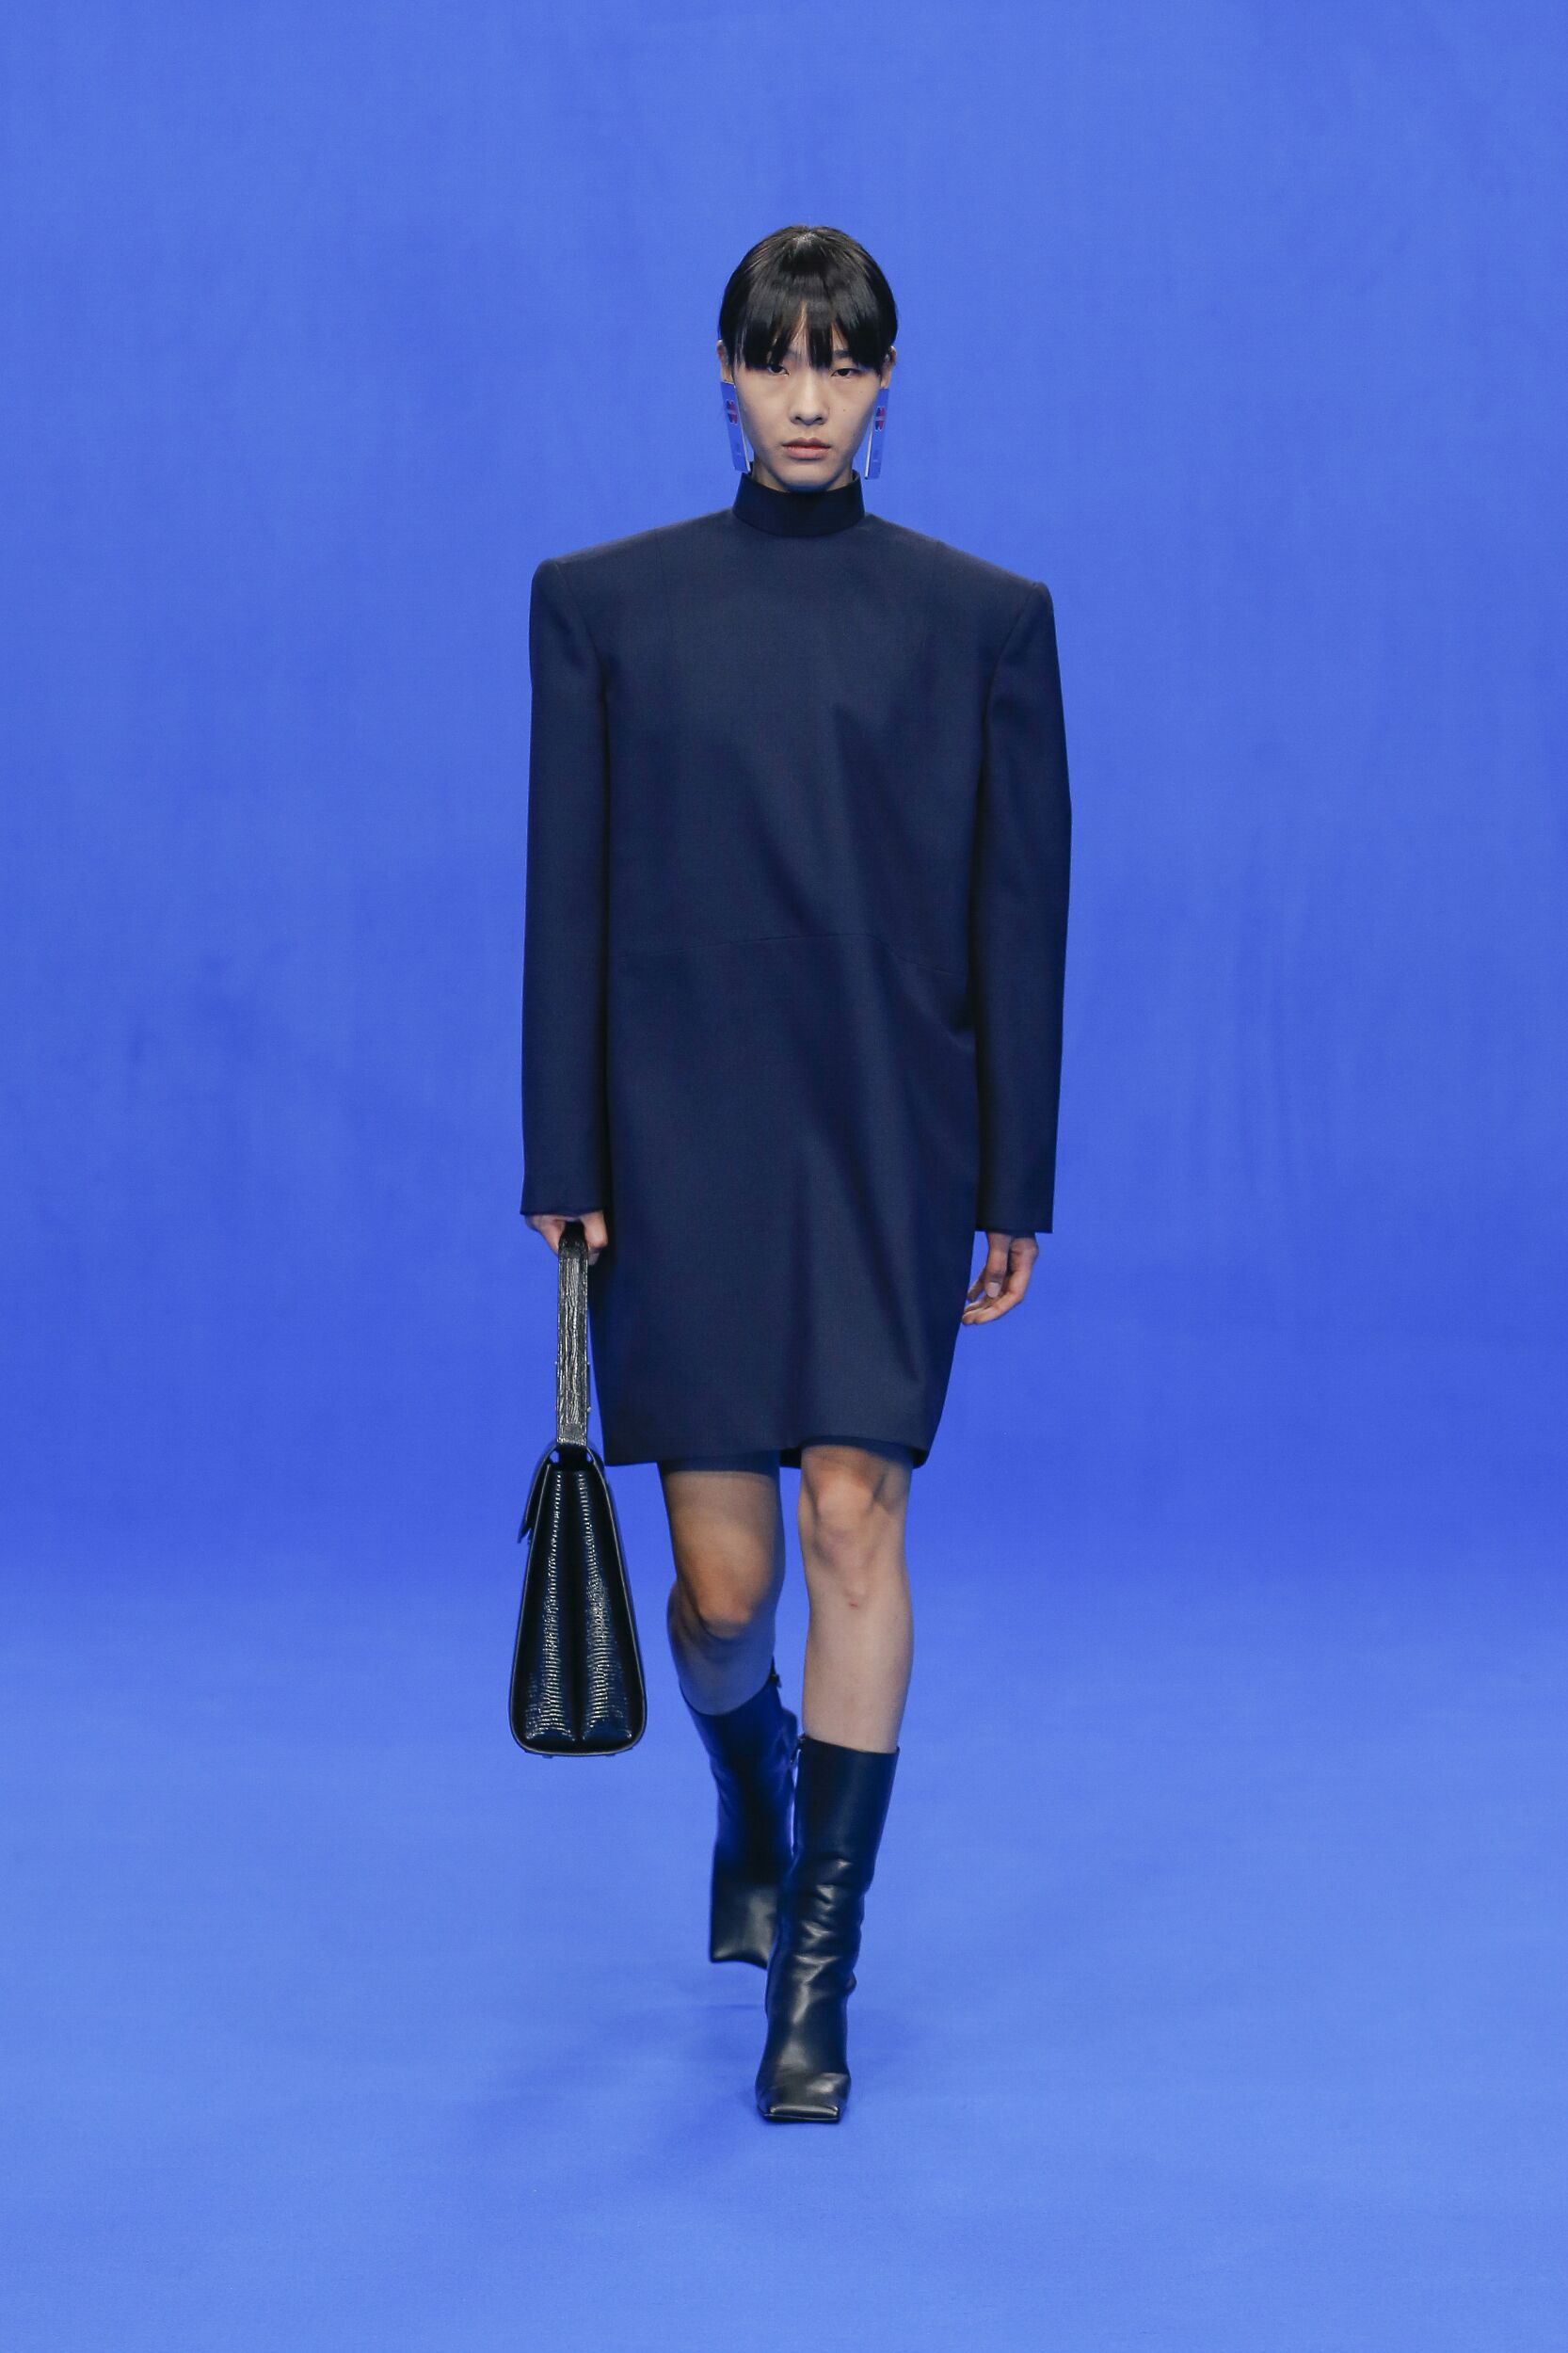 Runway Balenciaga Spring Summer 2020 Women's Collection Paris Fashion Week